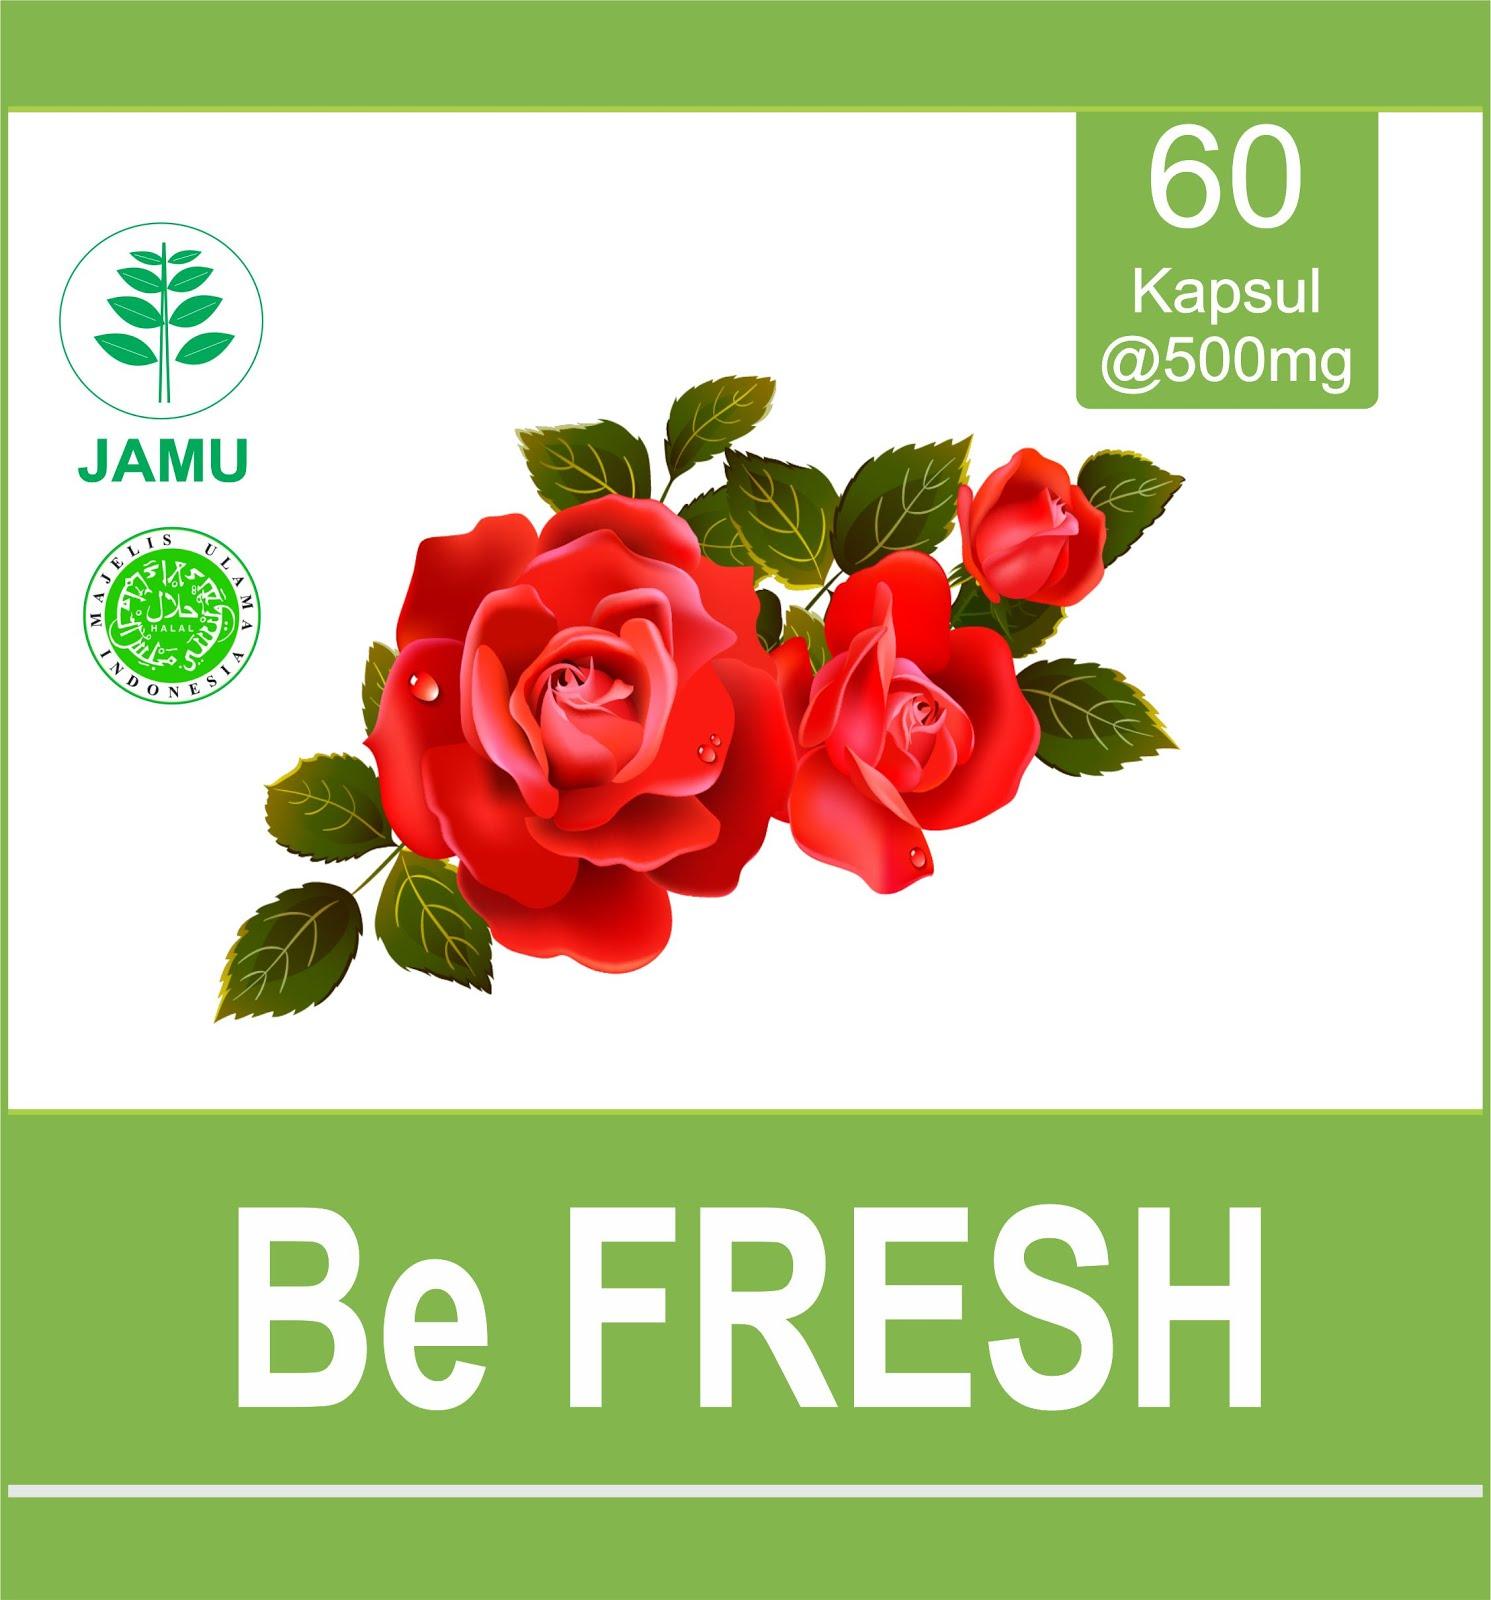 Be FRESH  @60 Kapsul Herbal